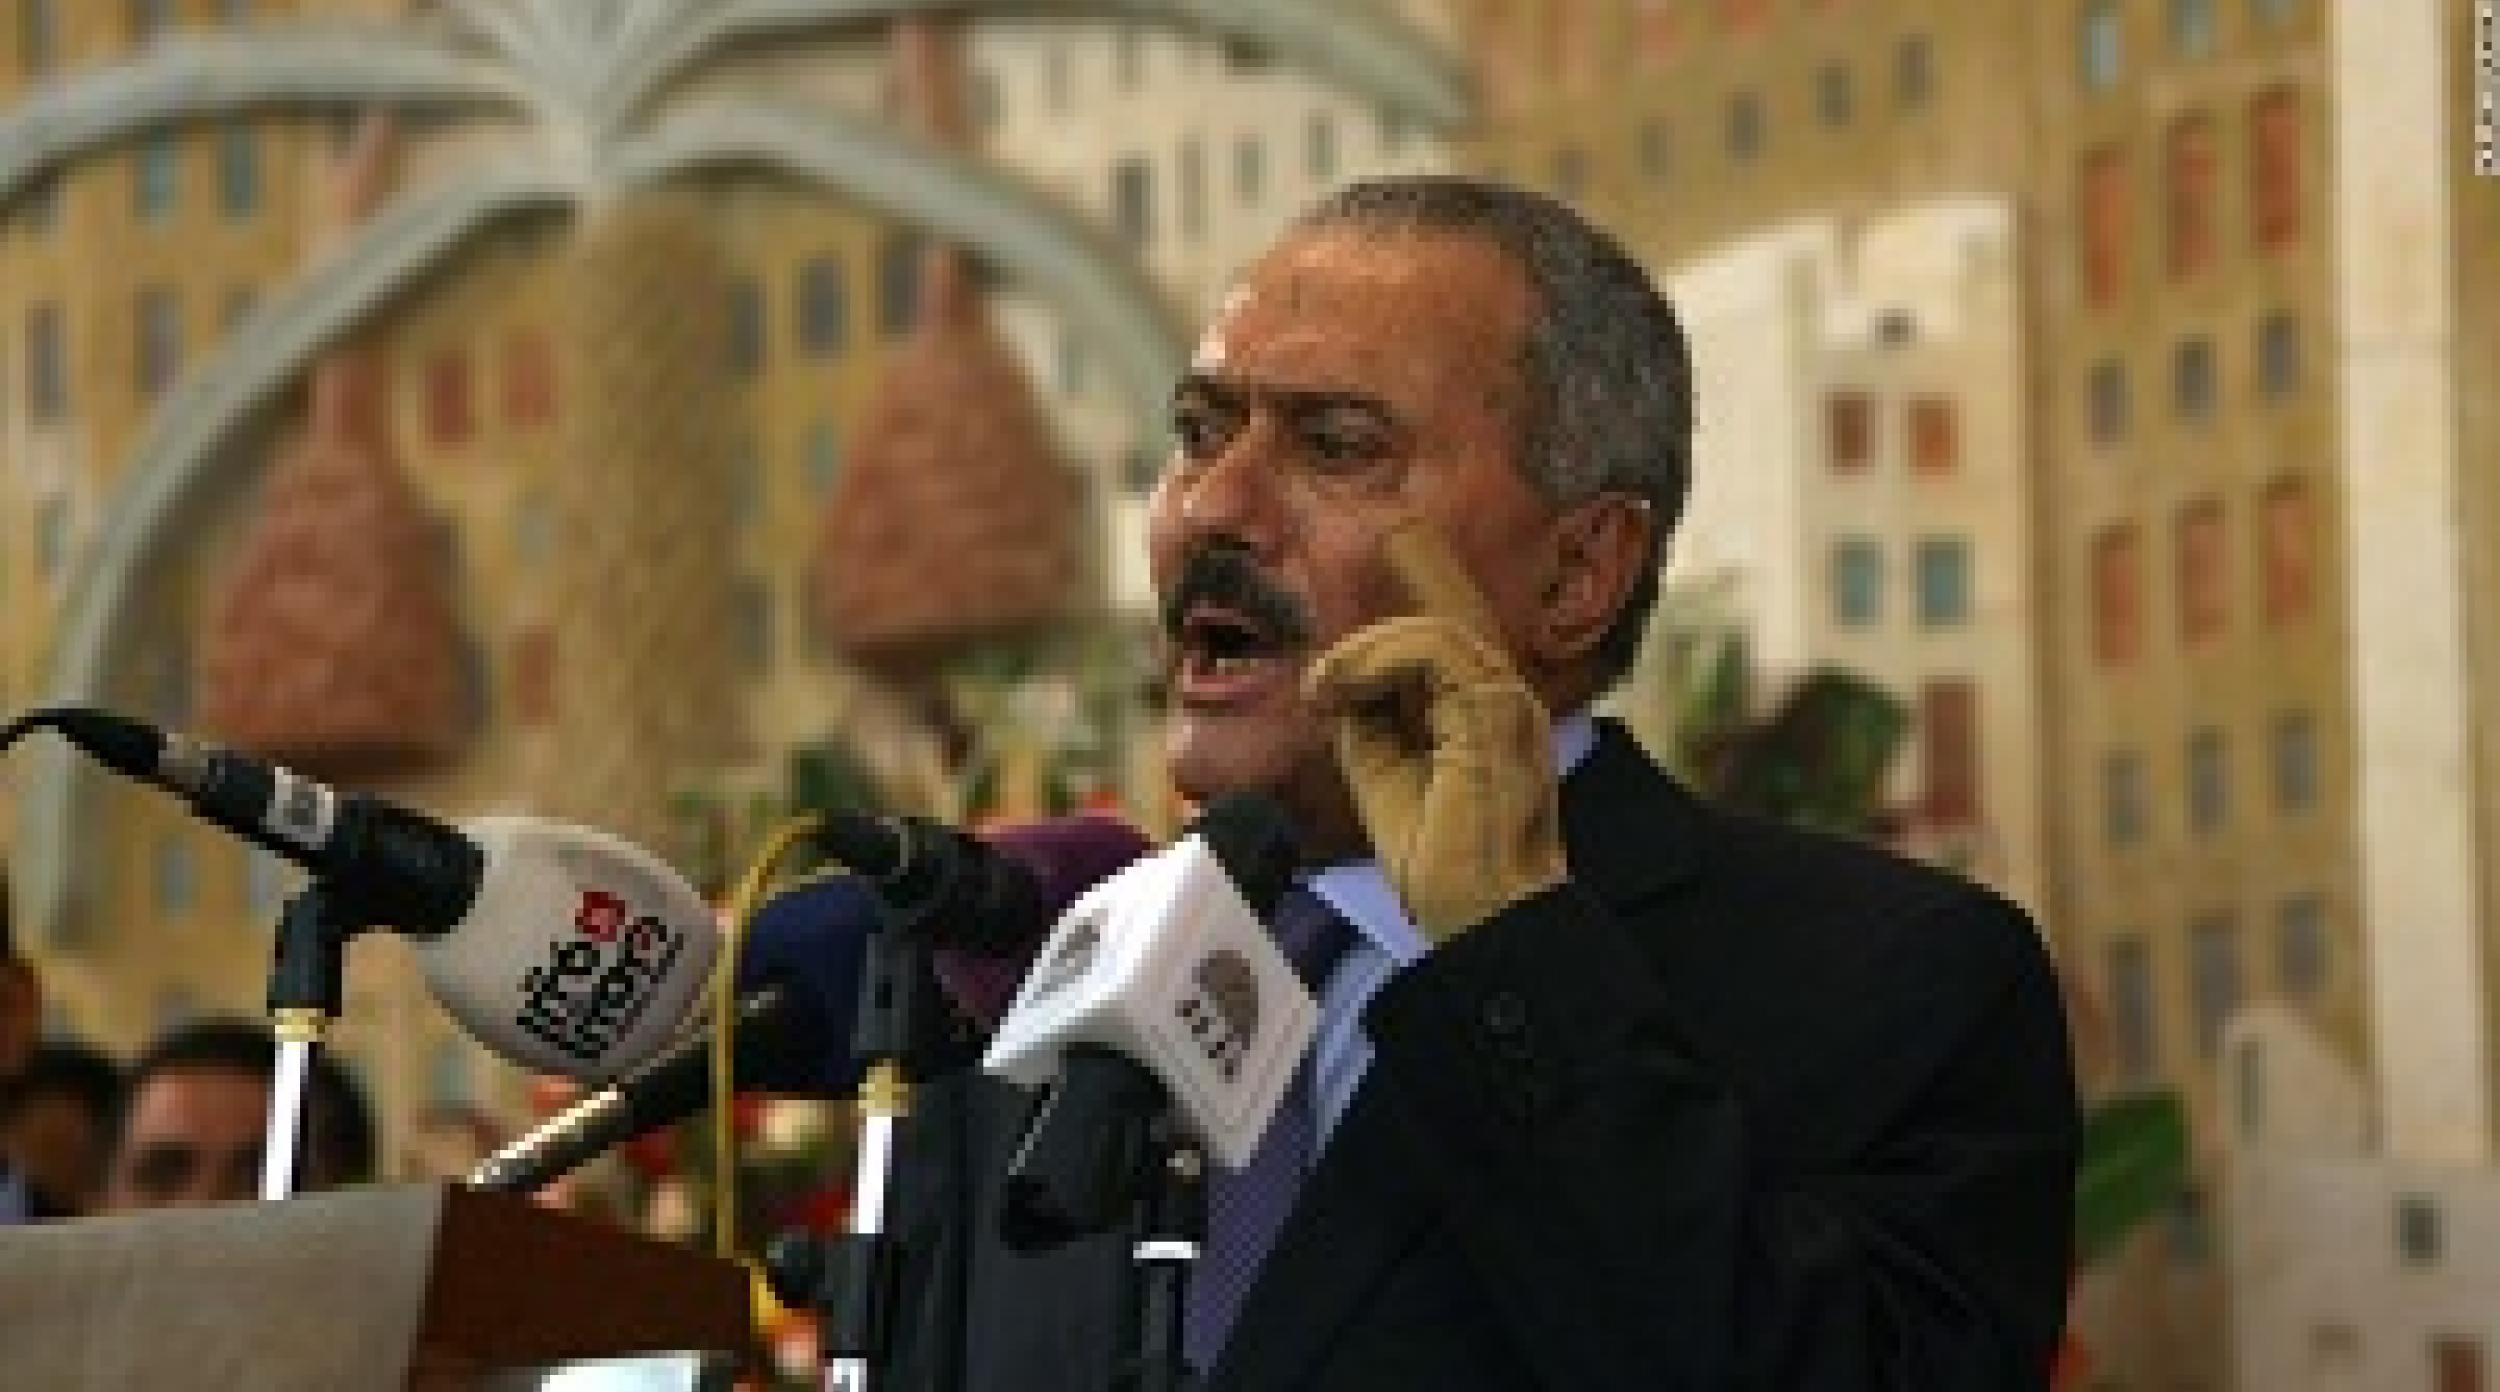 NEWS: የየመን የቀድሞ መሪ አሊ አብዱላህ ሳሌህ ተገደሉ - Yemen's Former President Ali Abdullah Saleh Killed Trying to Flee Sanaa